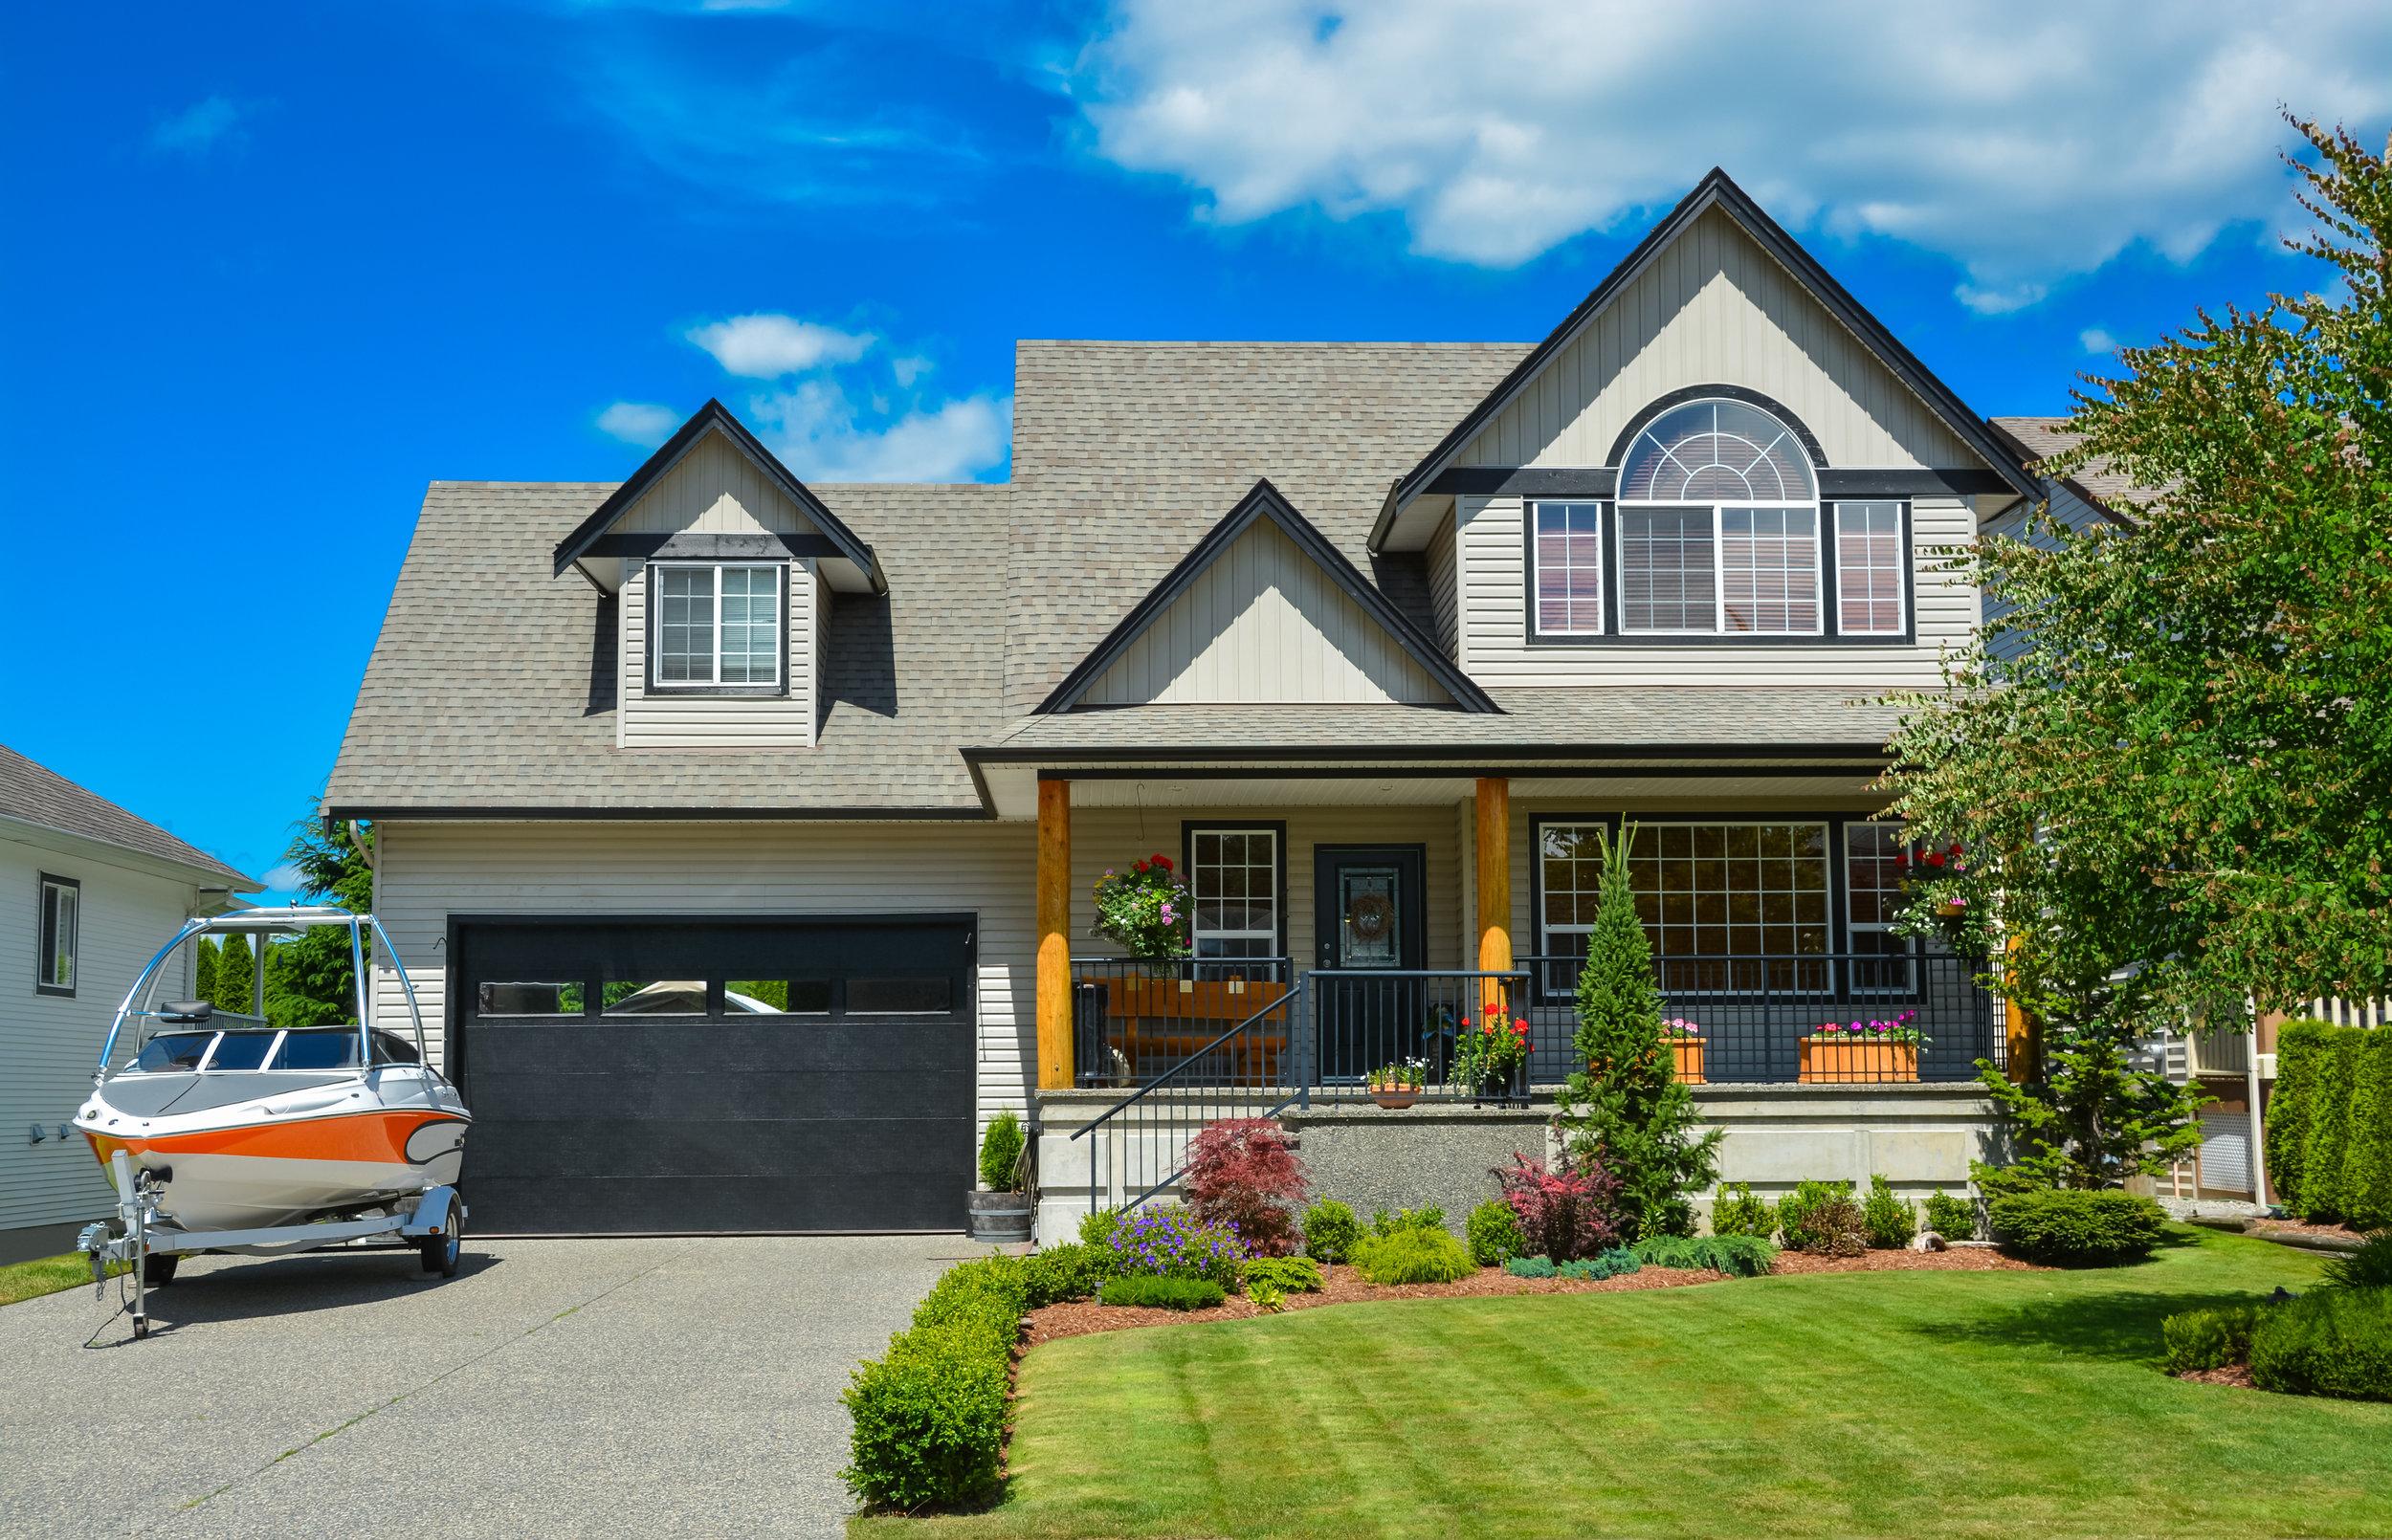 bigstock-Suburban-House-With-Landscapin-279609763.jpg